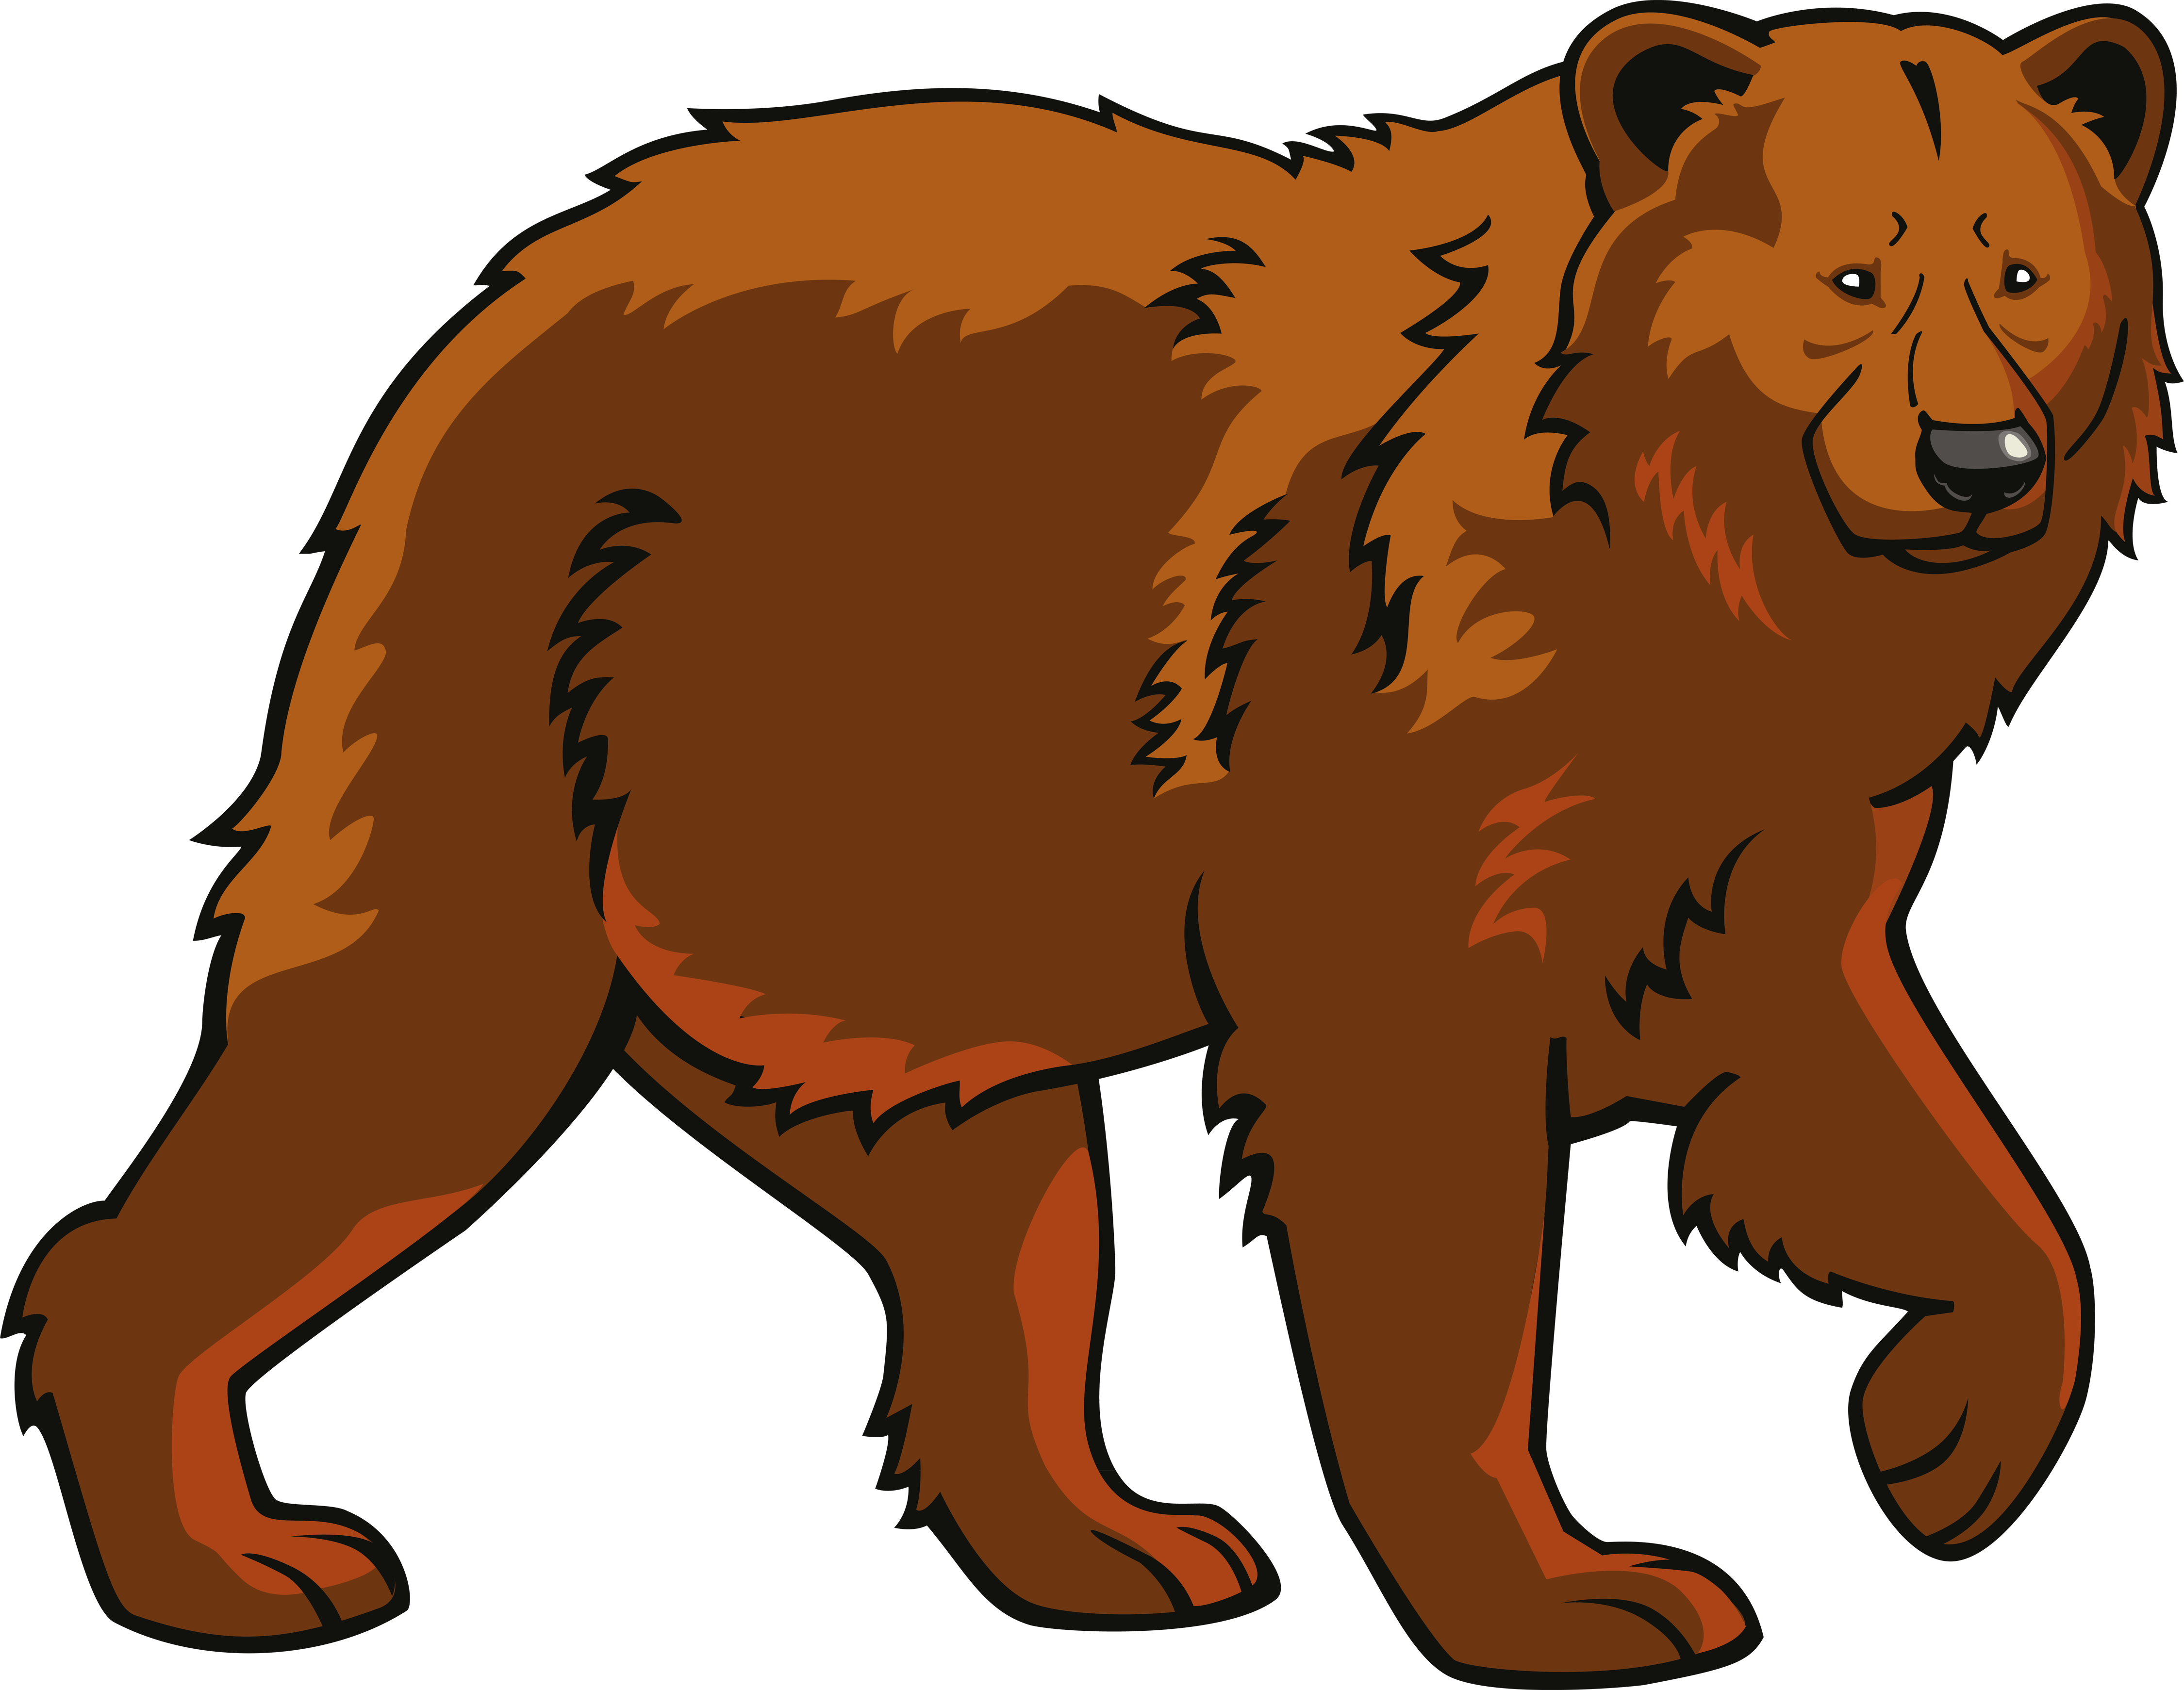 png royalty free download Polar eurasian brown clip. Bear clipart png